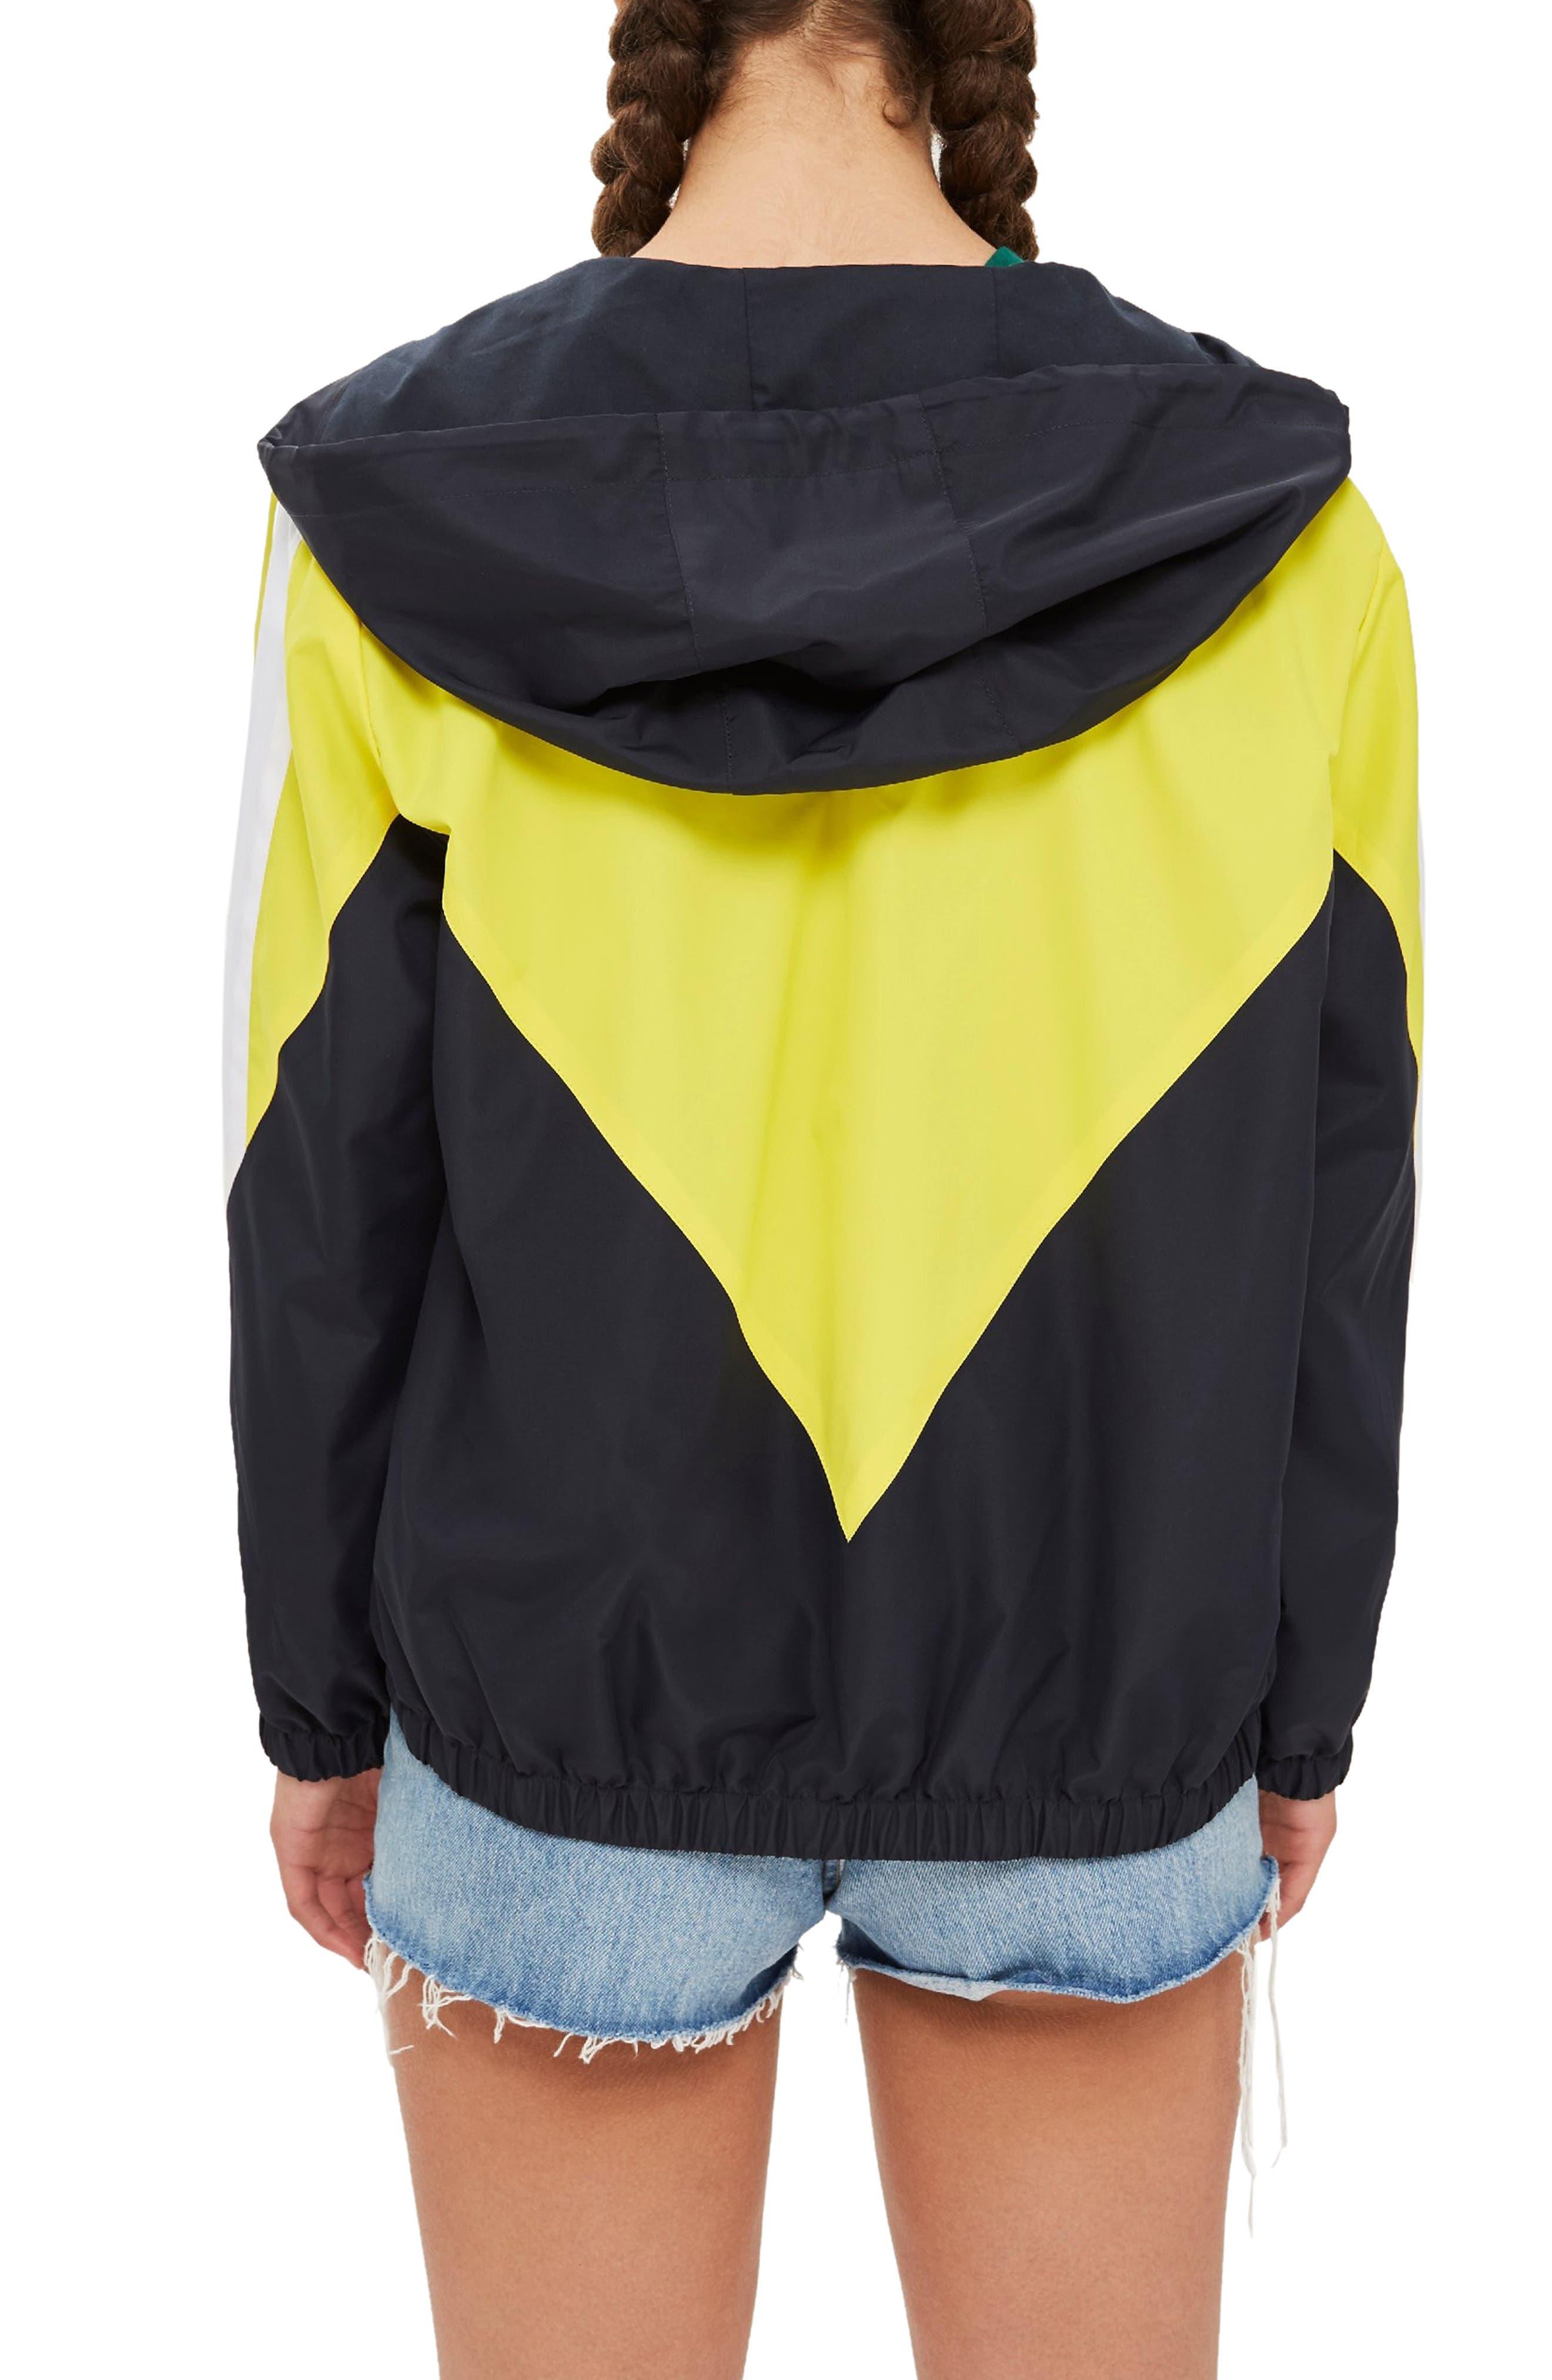 Texas Colorblock Windbreaker Jacket,                             Alternate thumbnail 2, color,                             YELLOW MULTI